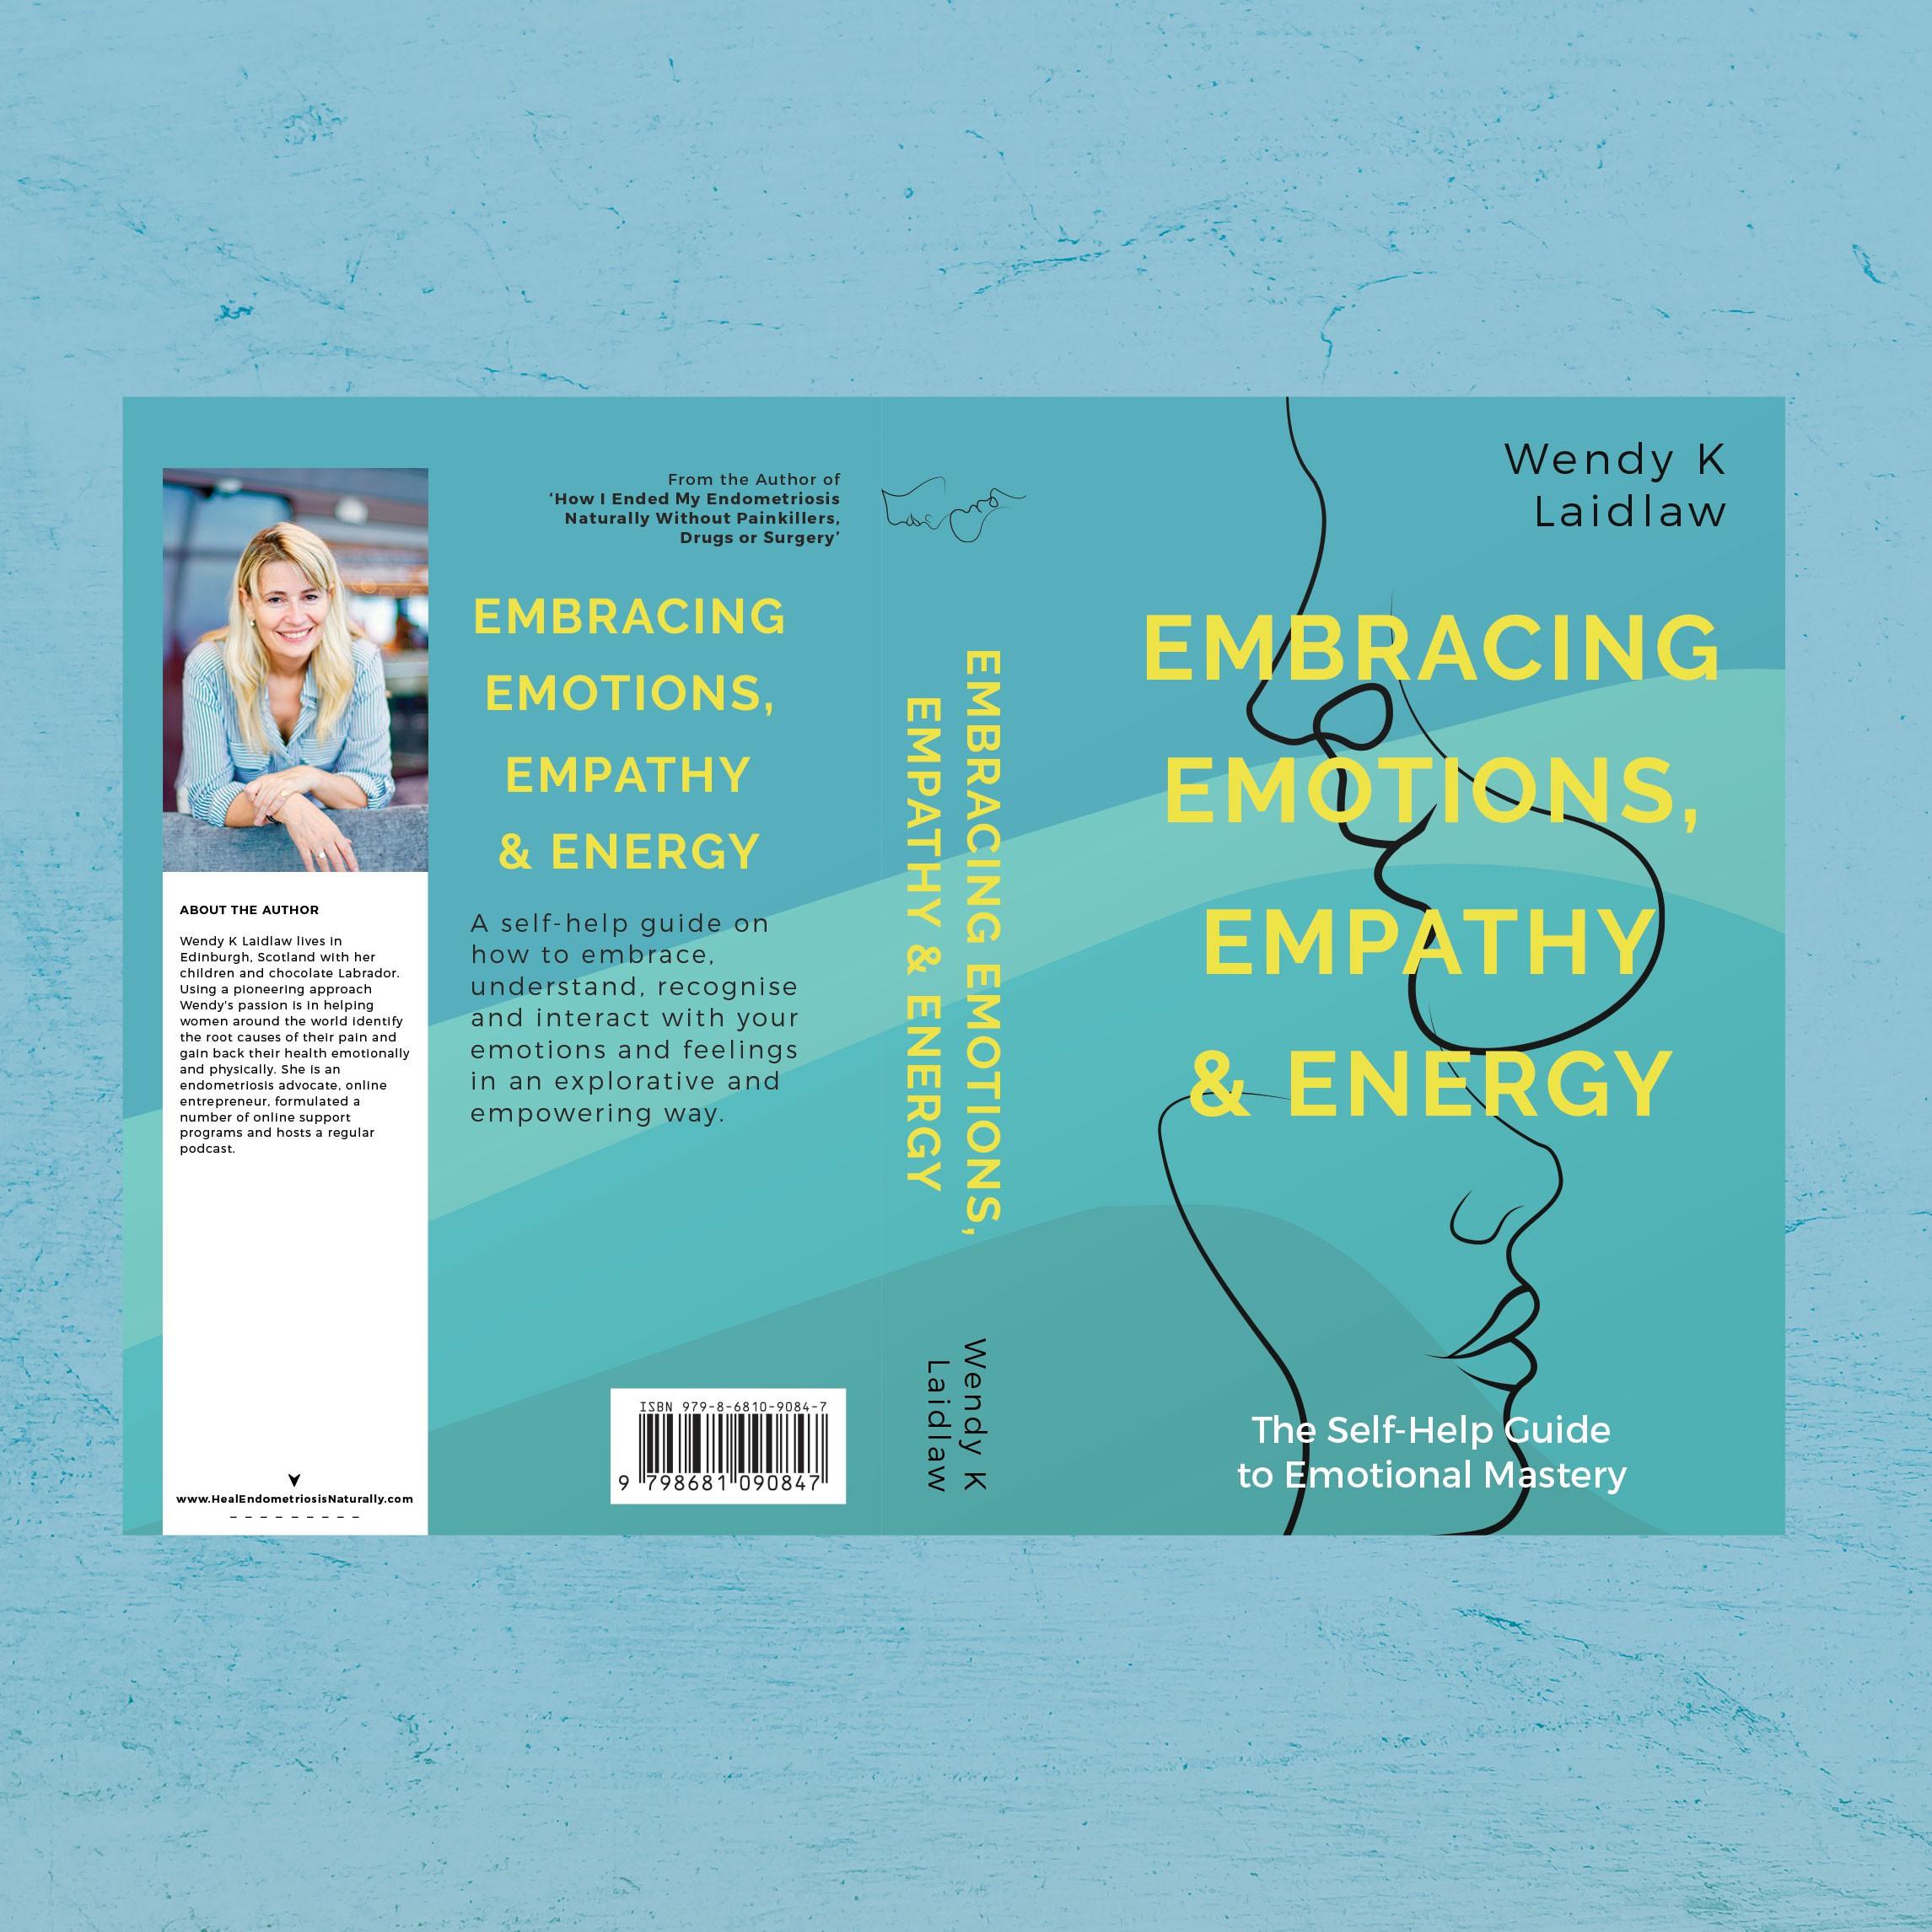 Design Embracing Emotions, Empathy & Energy Book Cover